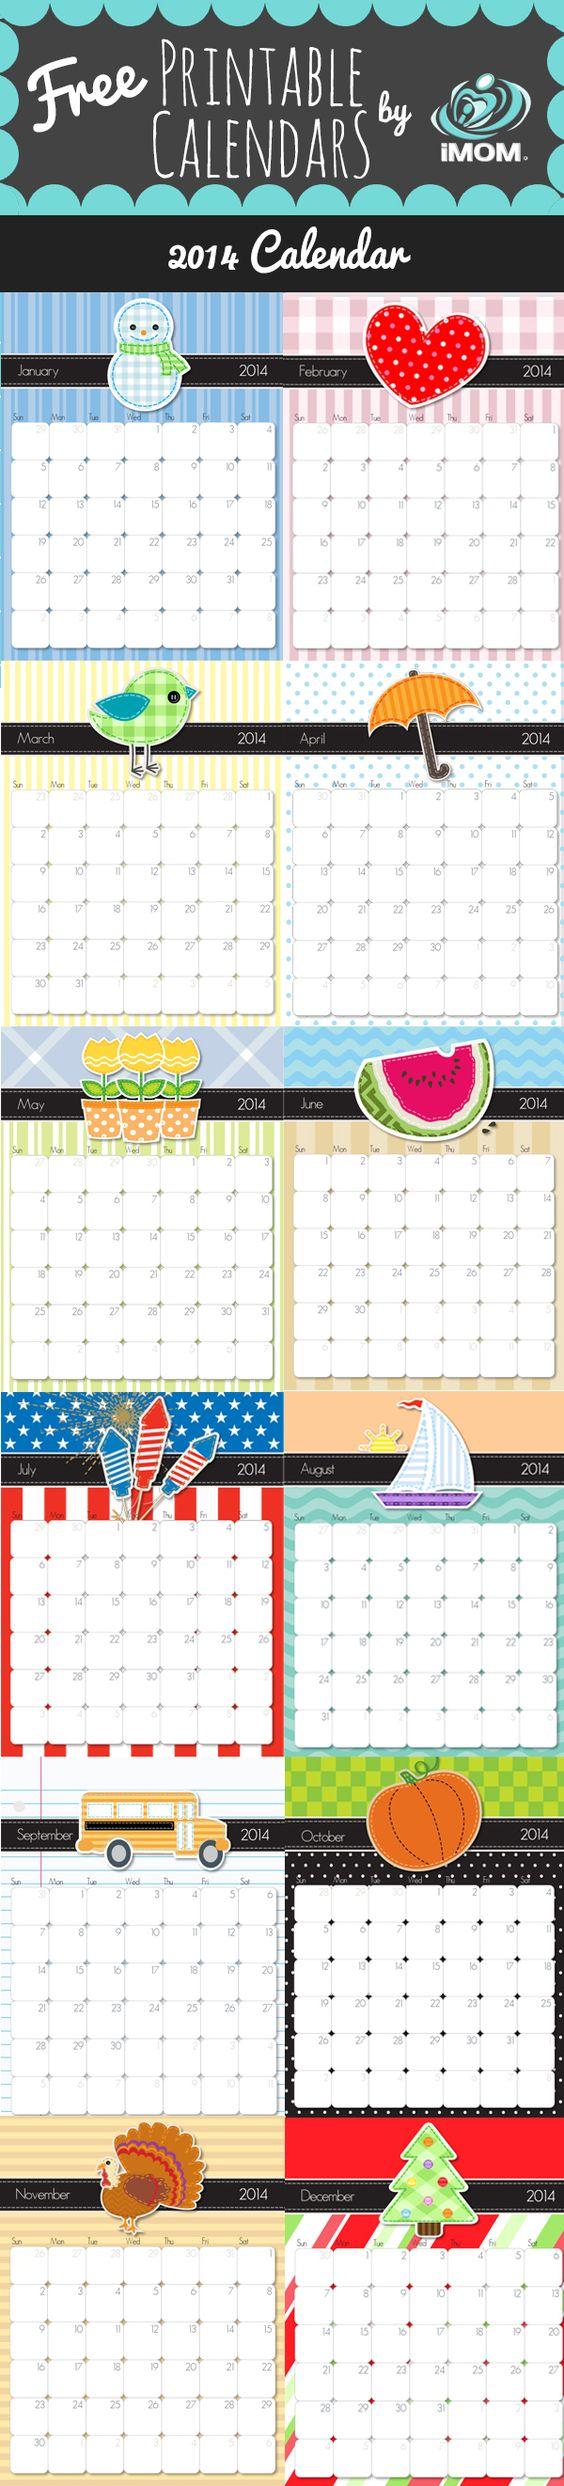 Next Year Calendar : Cute and crafty printable calendar free